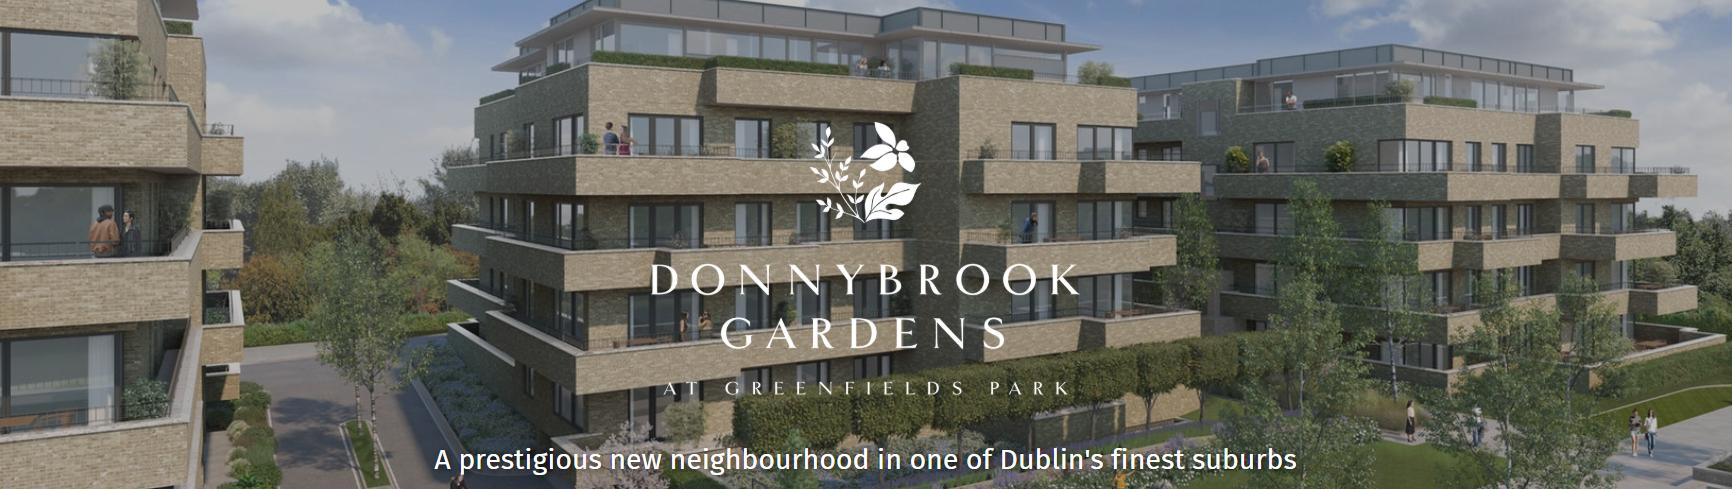 Case Study: Donnybrook Gardens